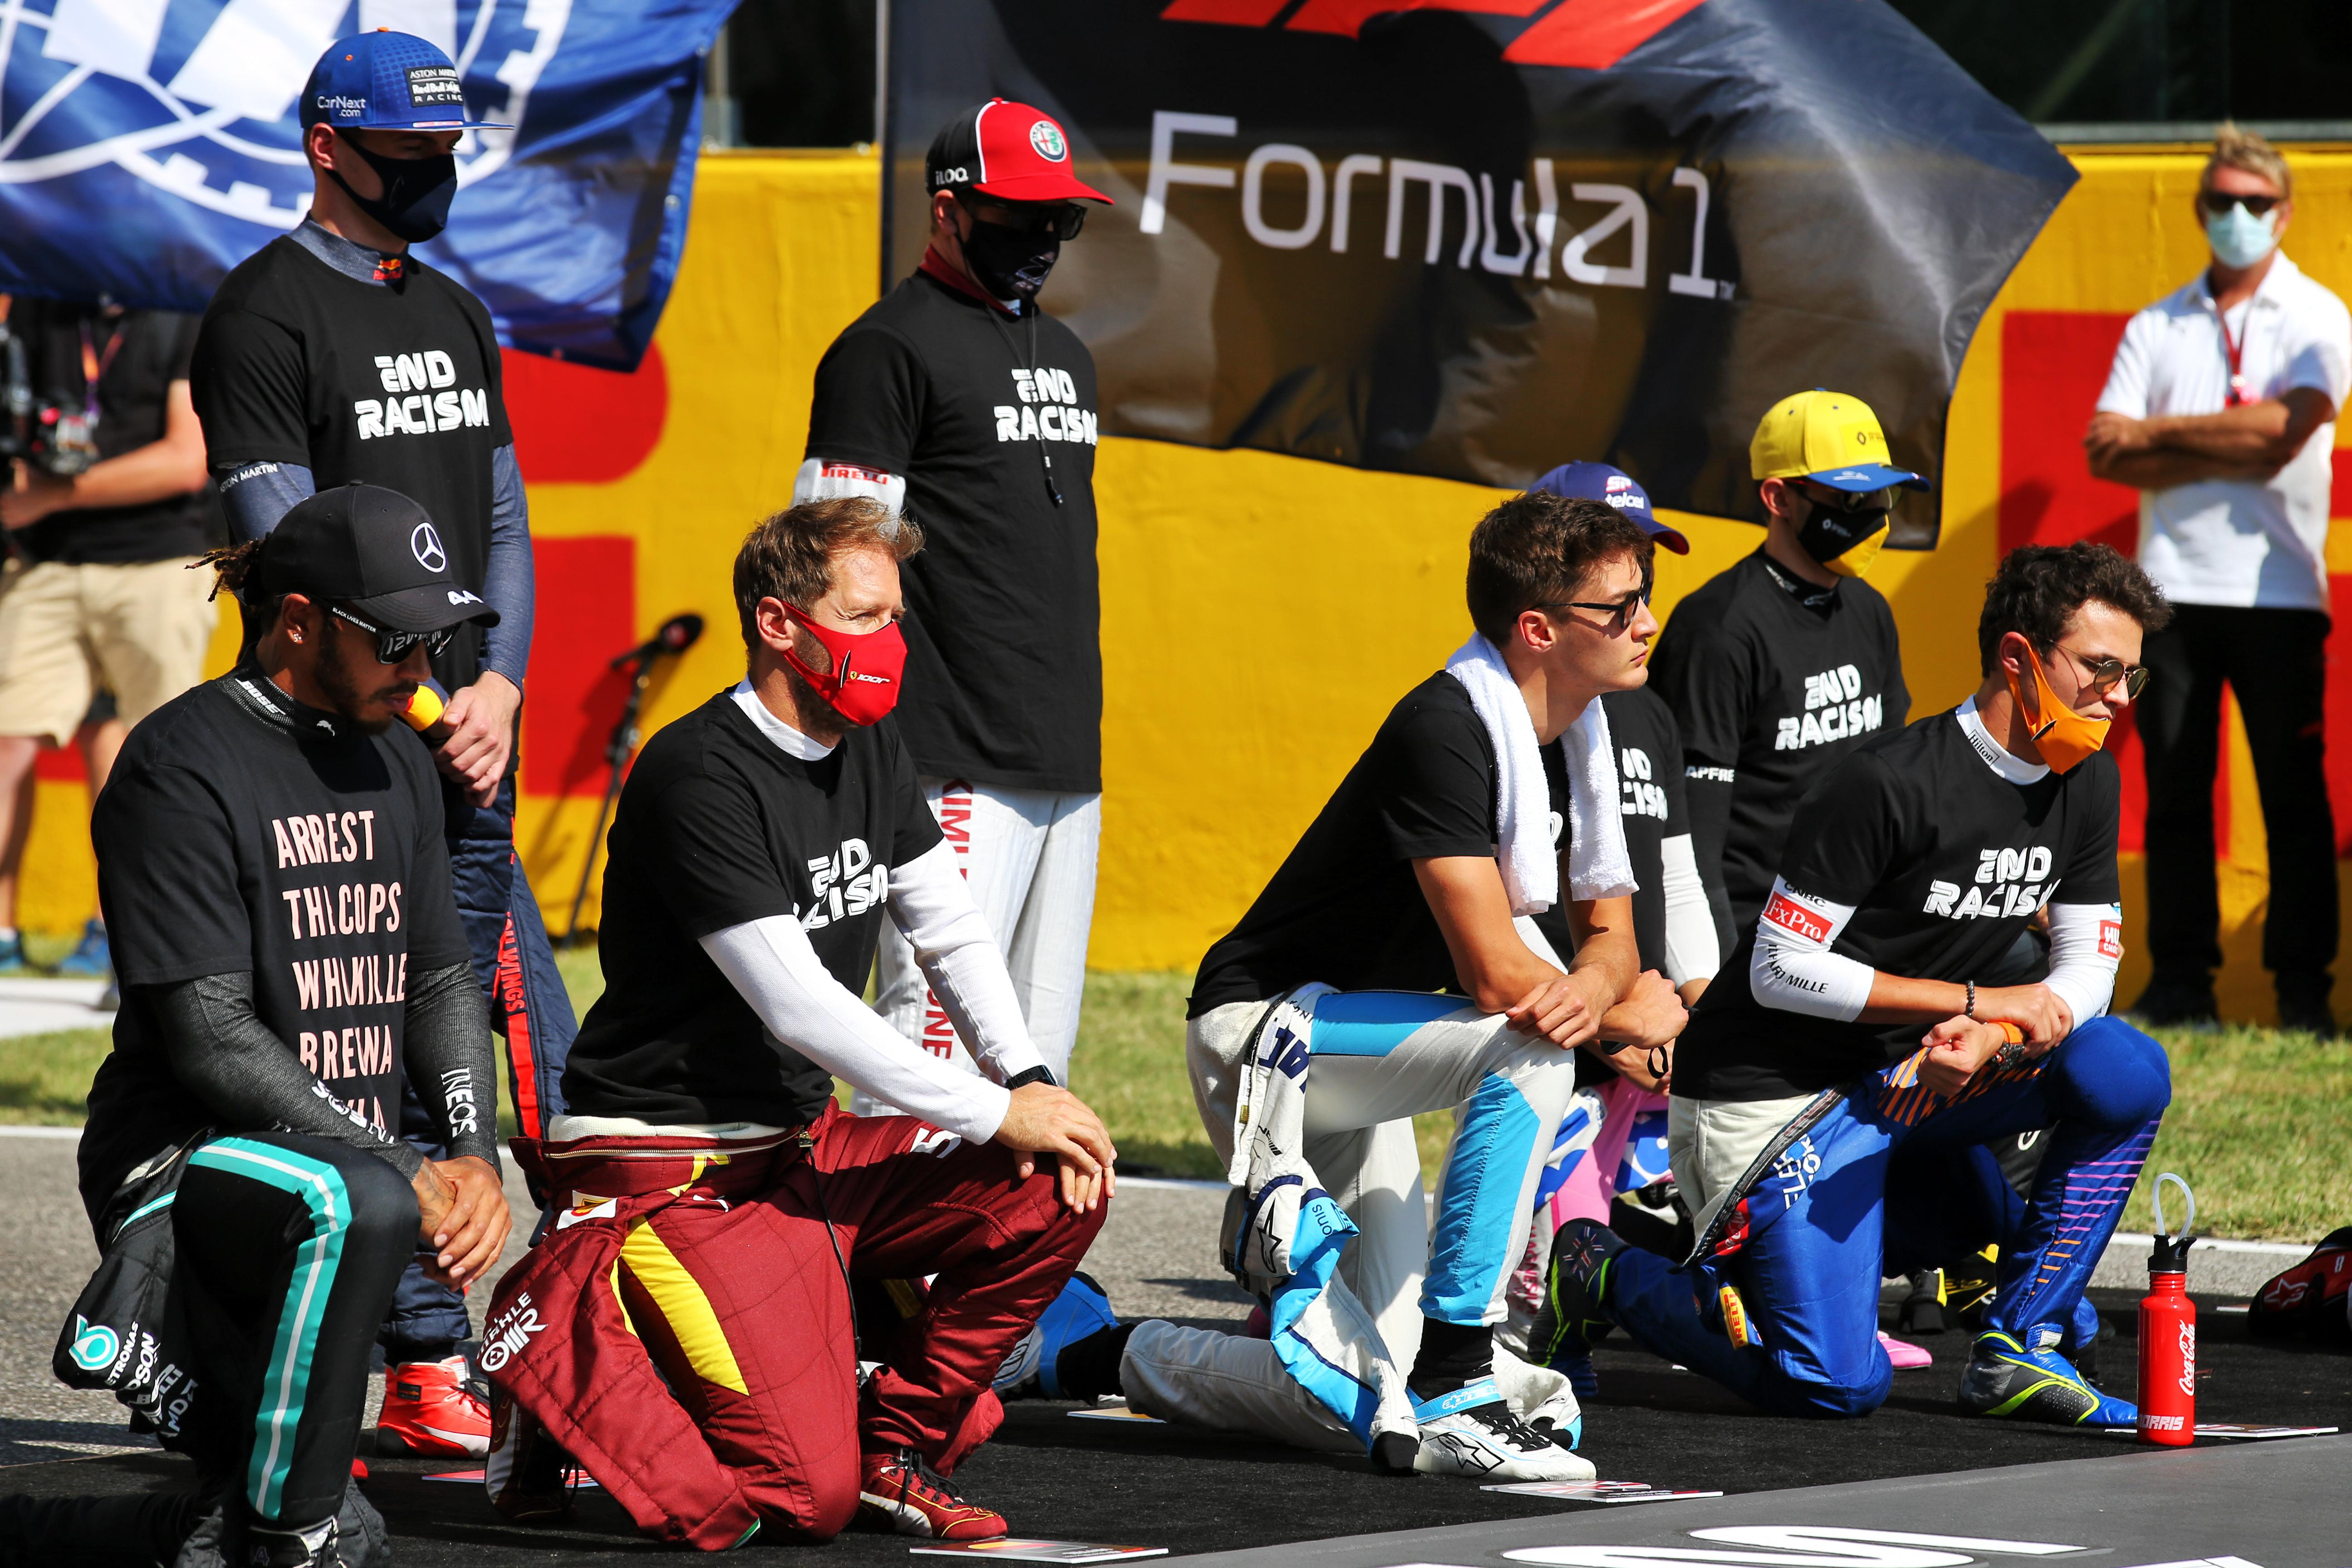 Lewis Hamilton Mugello F1 anti-racism stand